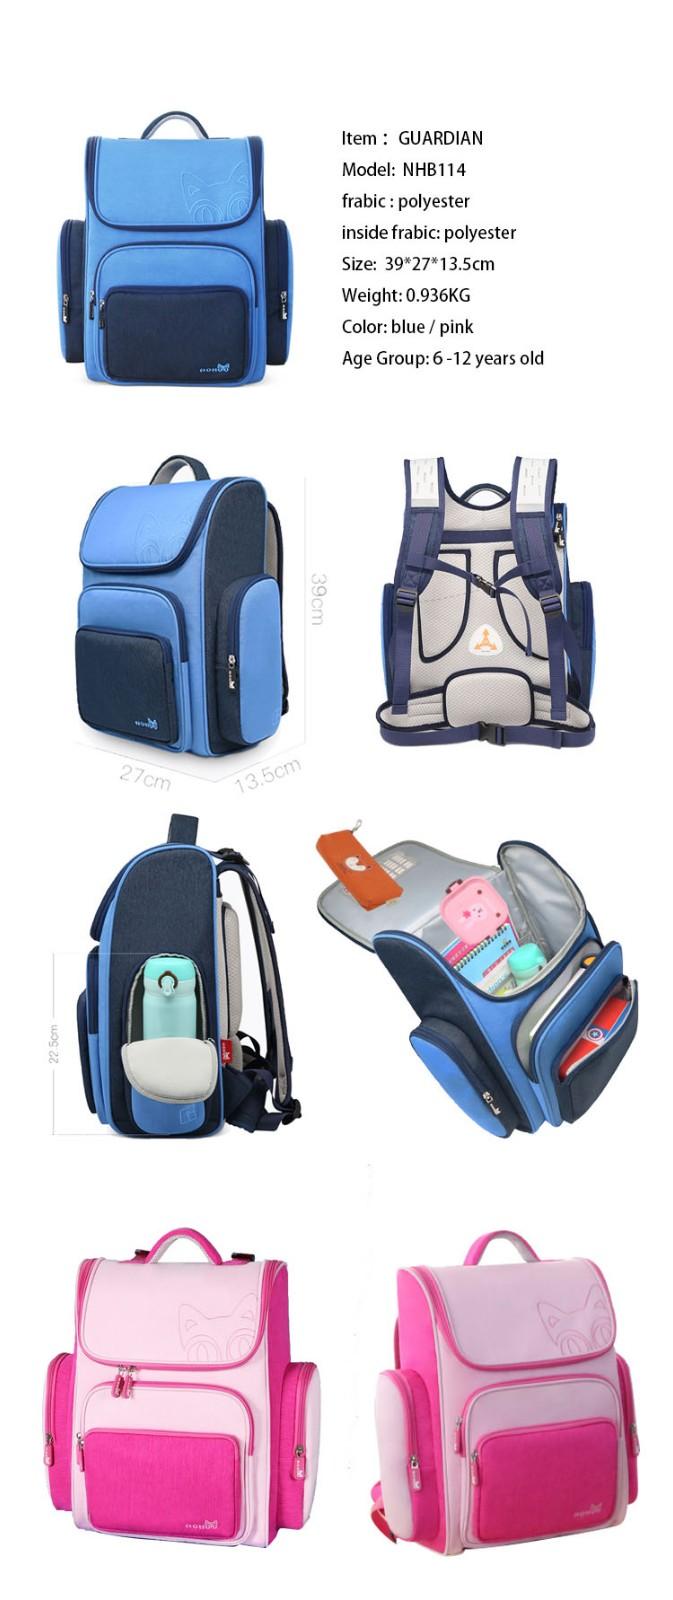 Nohoo Children Products-Children School Backpack, New Design Lightweight For Student